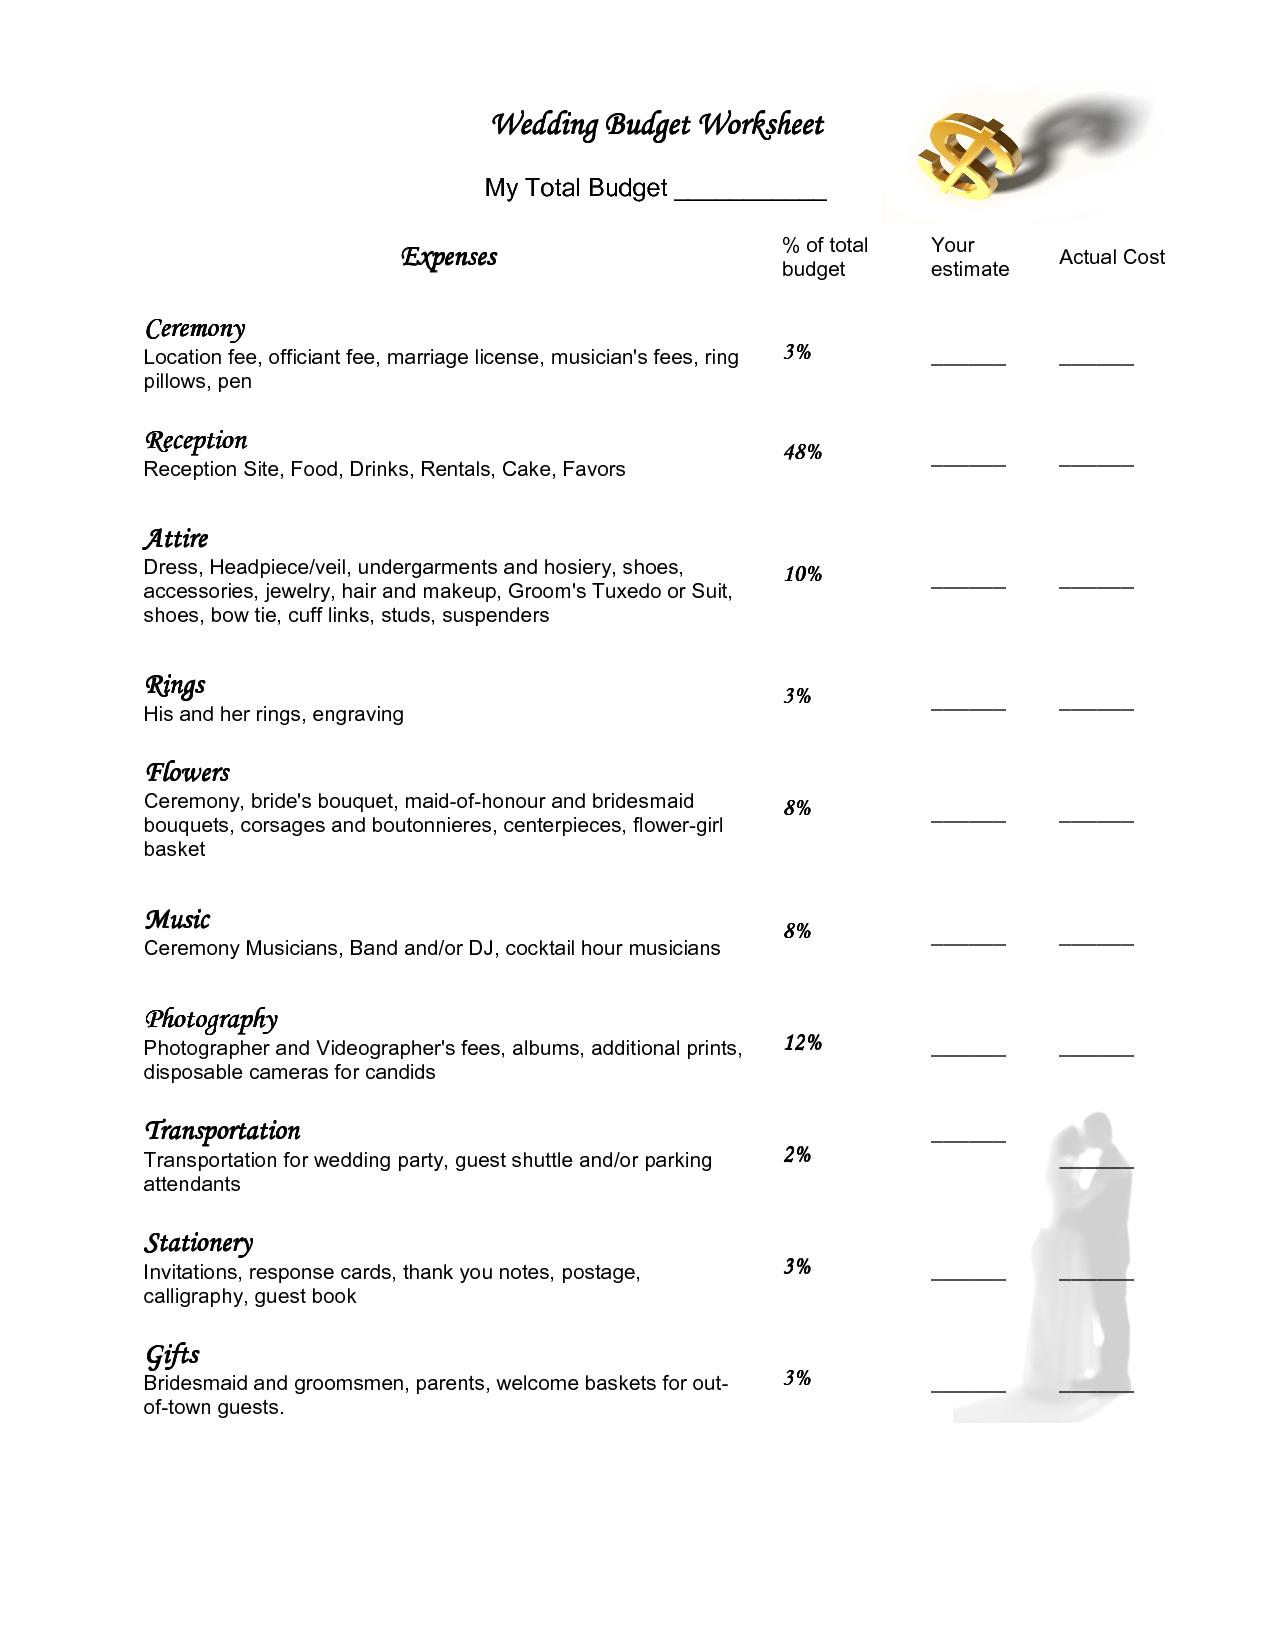 Ceremony Worksheet